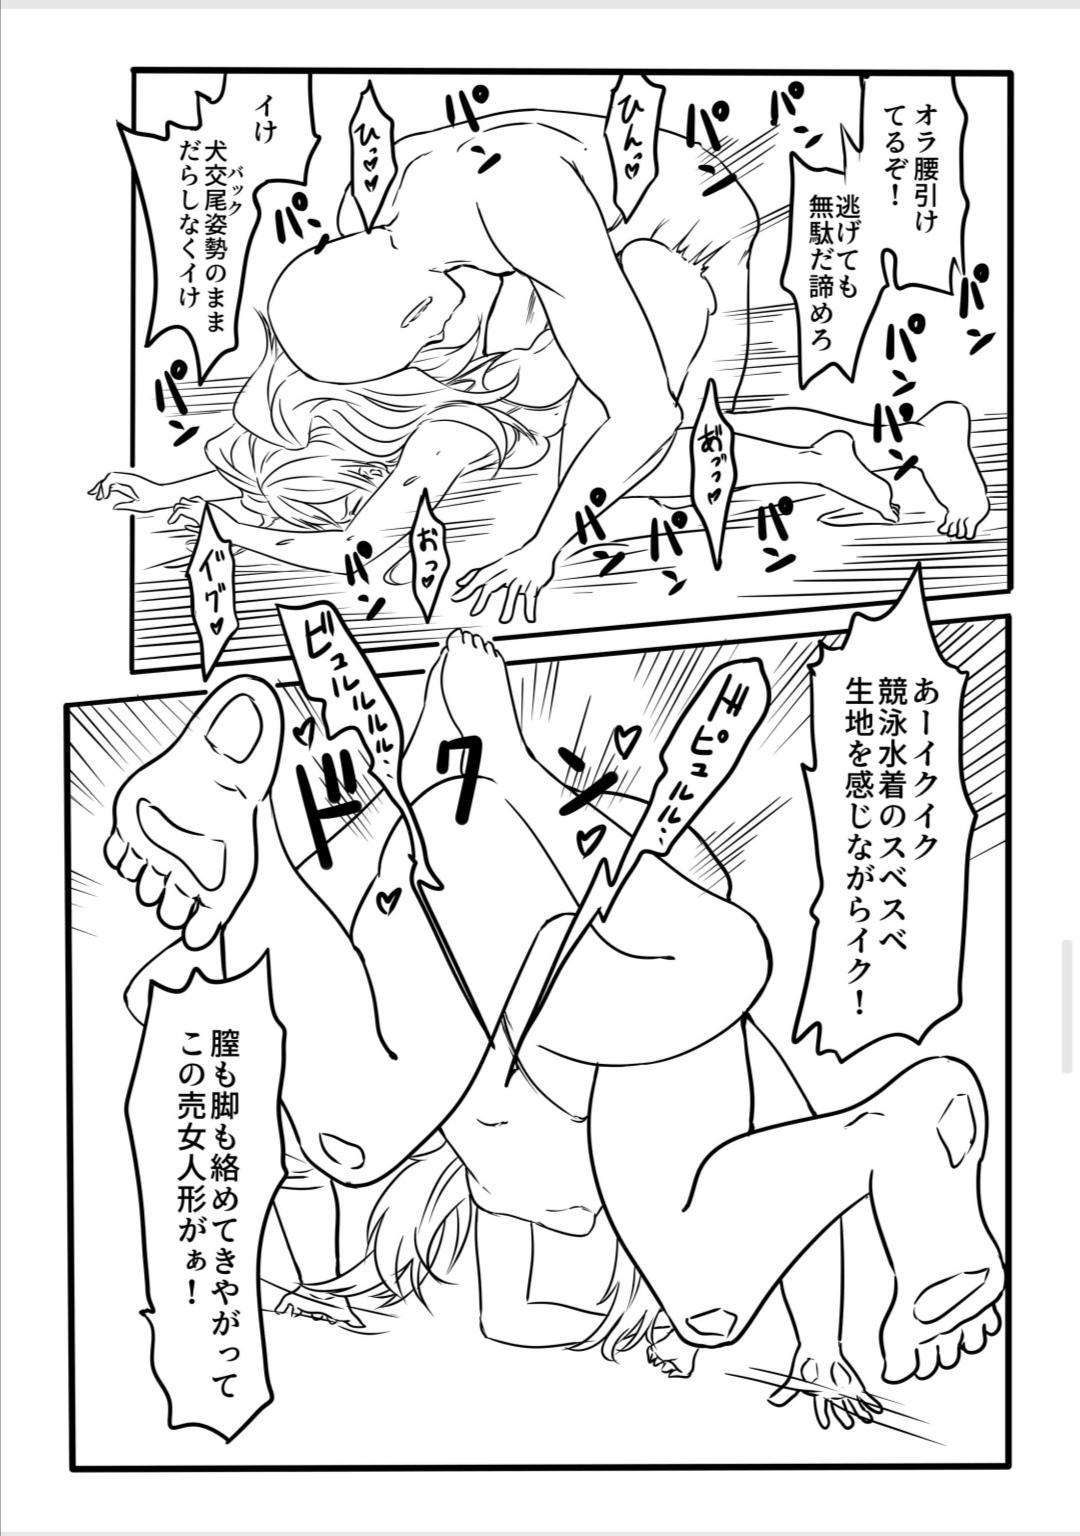 Hoshi 5 Hand Gun ga Sex Skin o Kiserarete Love Doll Mission o Shiirrareru Hon 12